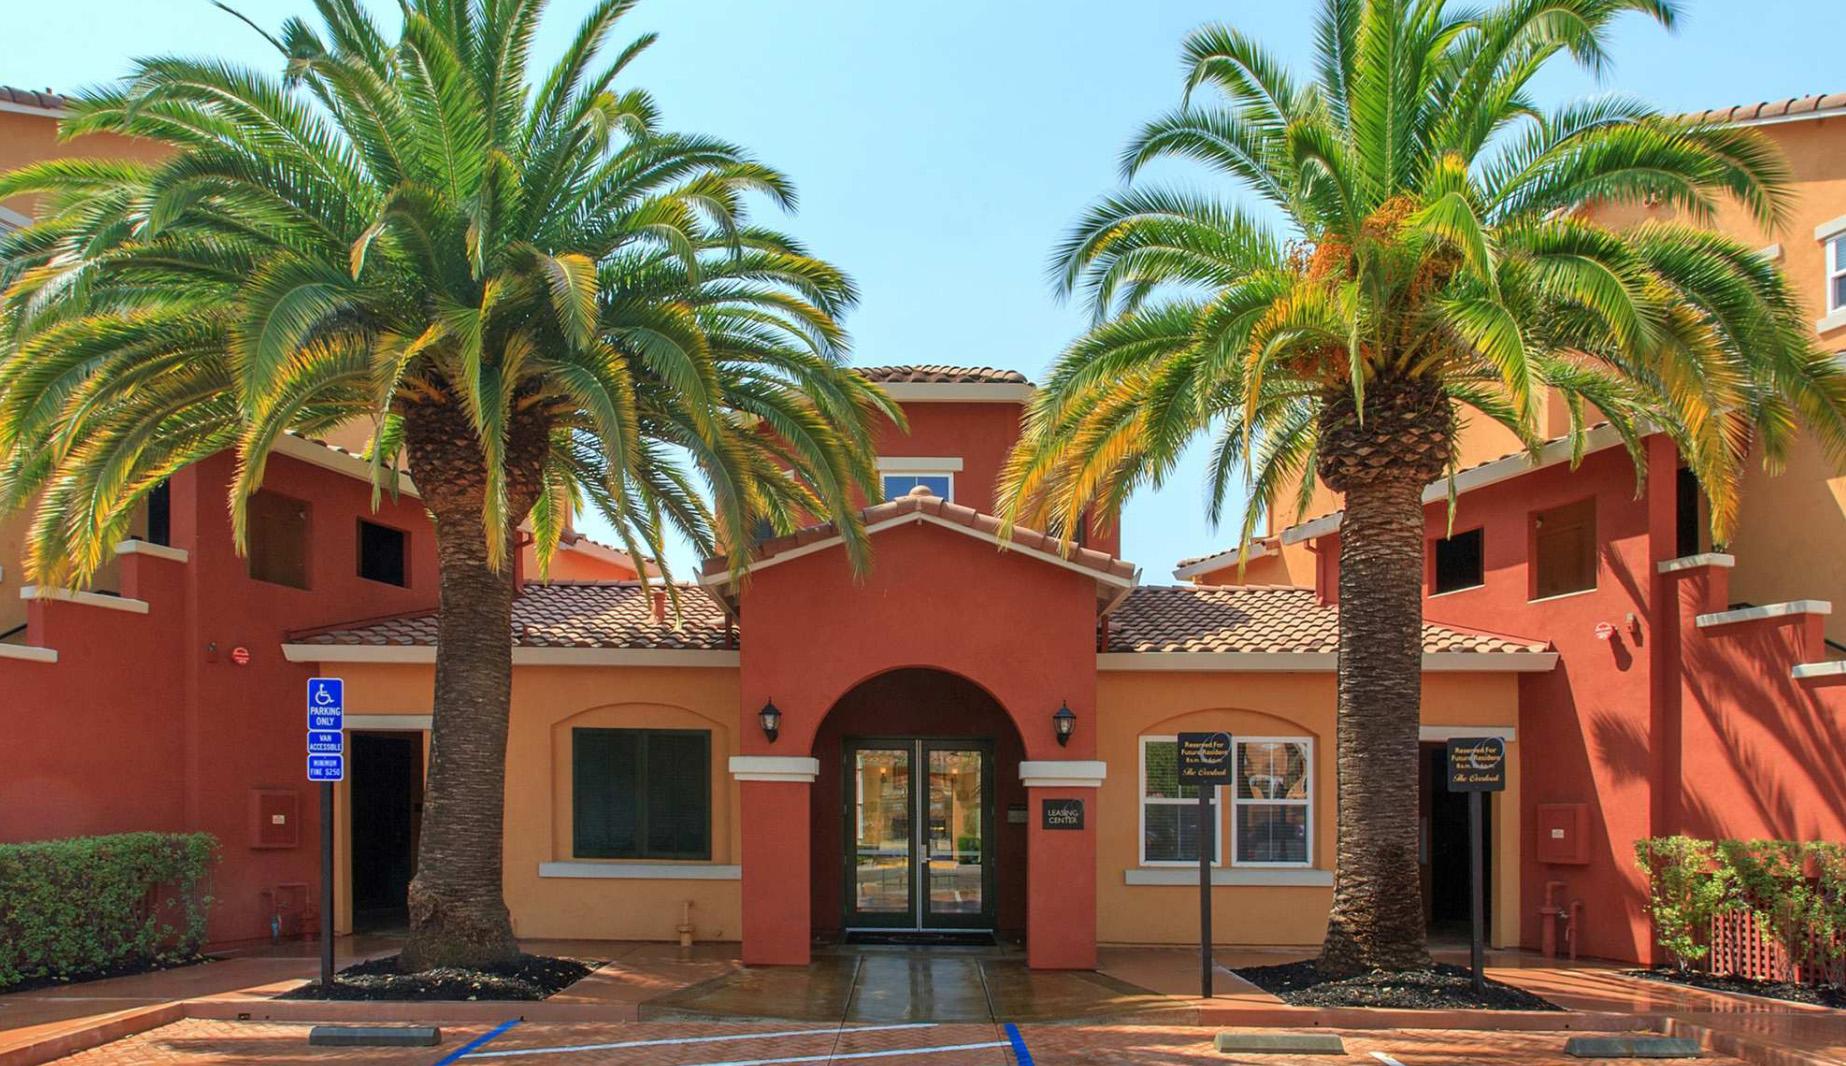 Median Rental in Santa Rosa For 2 Bedrooms is $2,140 - Here\'s What ...